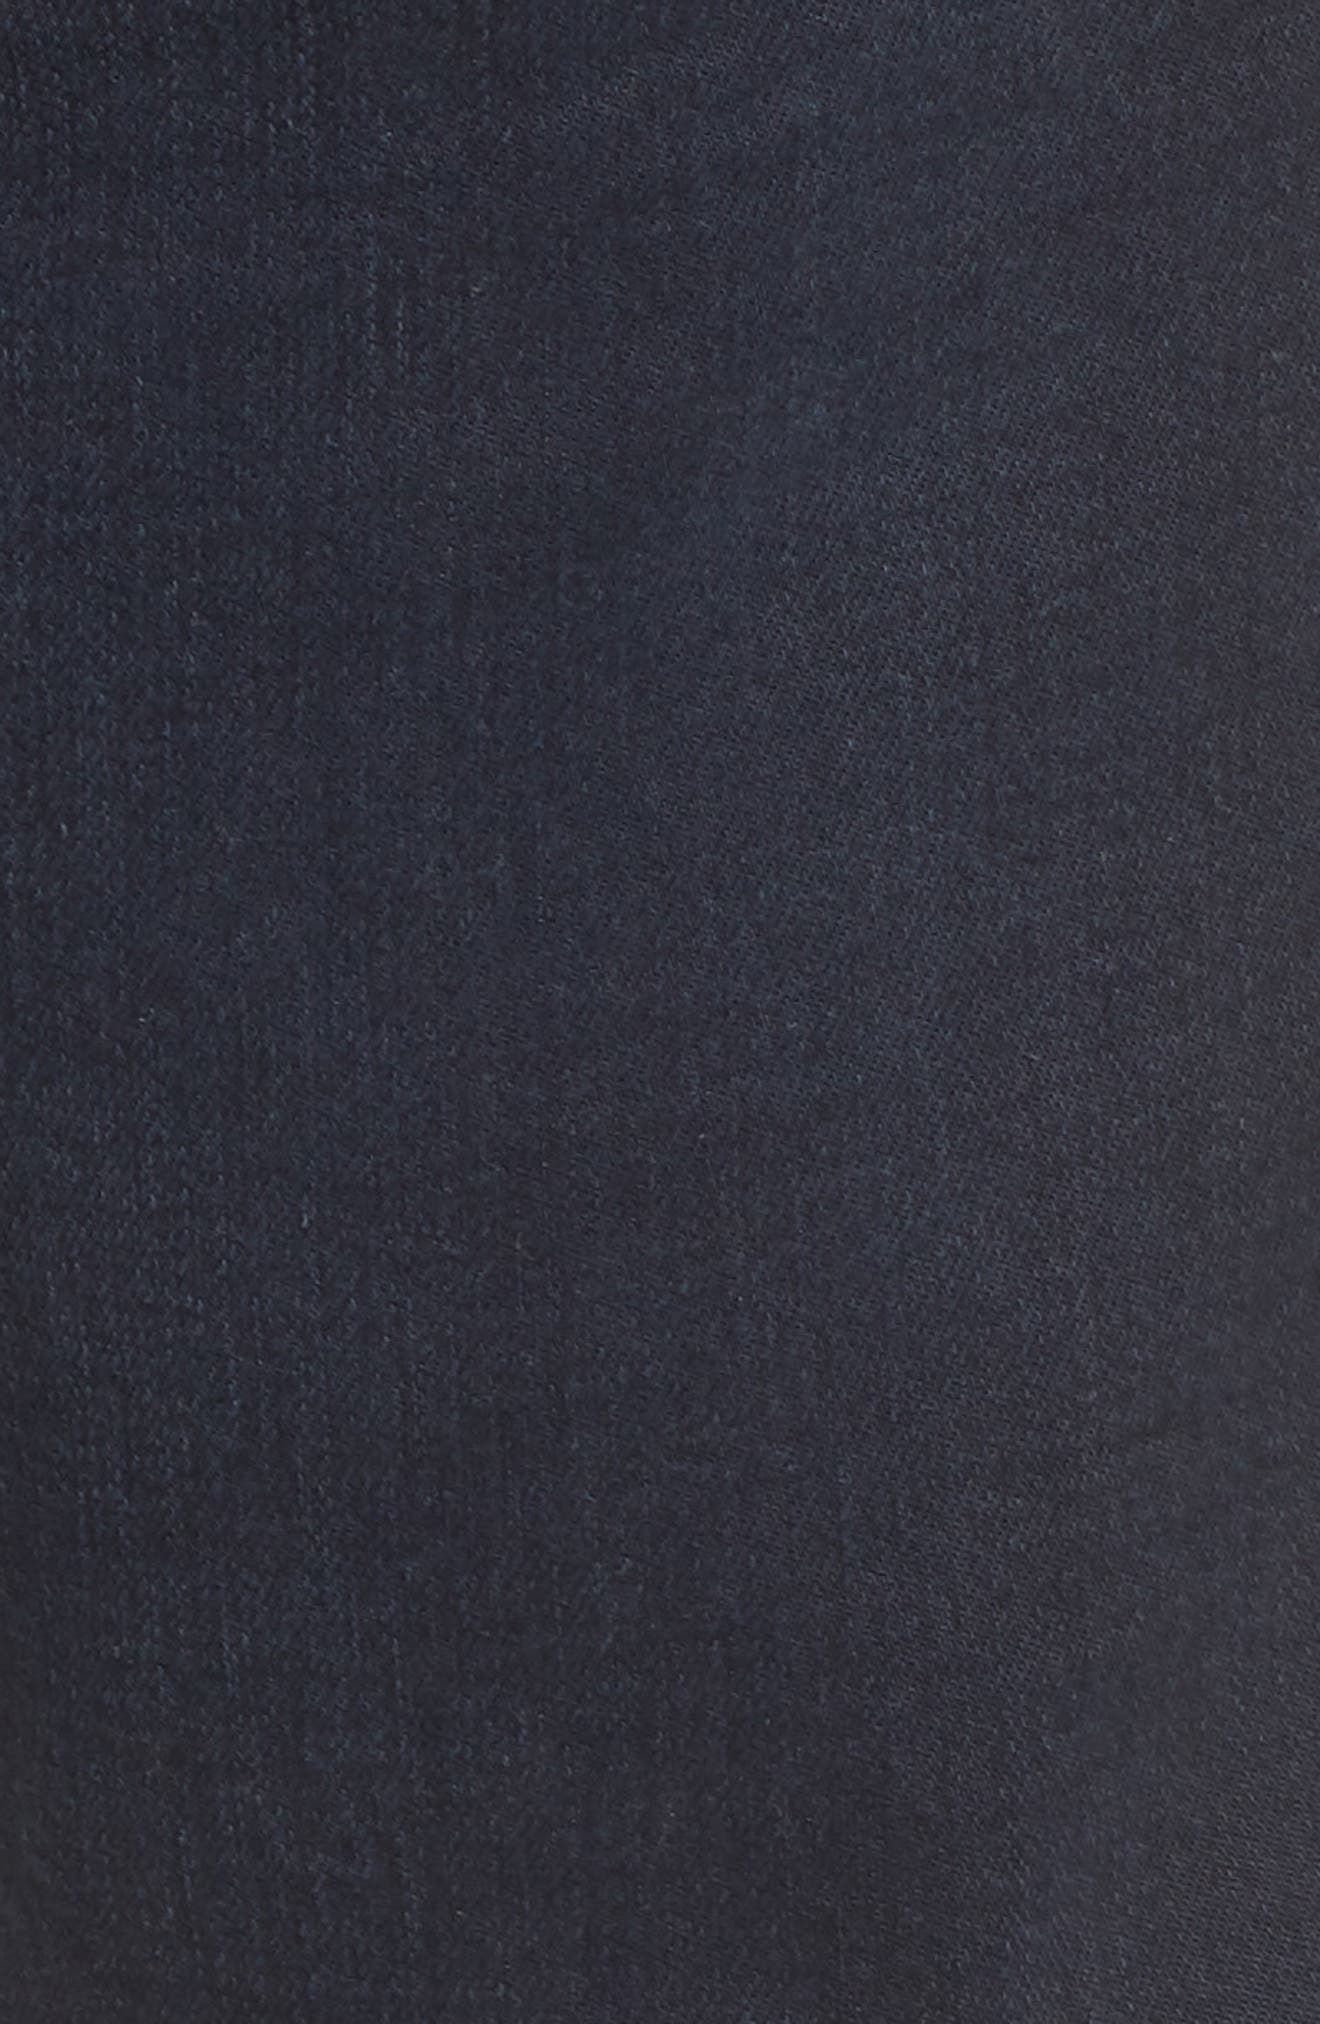 Iggy Skinny Fit Jeans,                             Alternate thumbnail 5, color,                             Blue Lines Broken